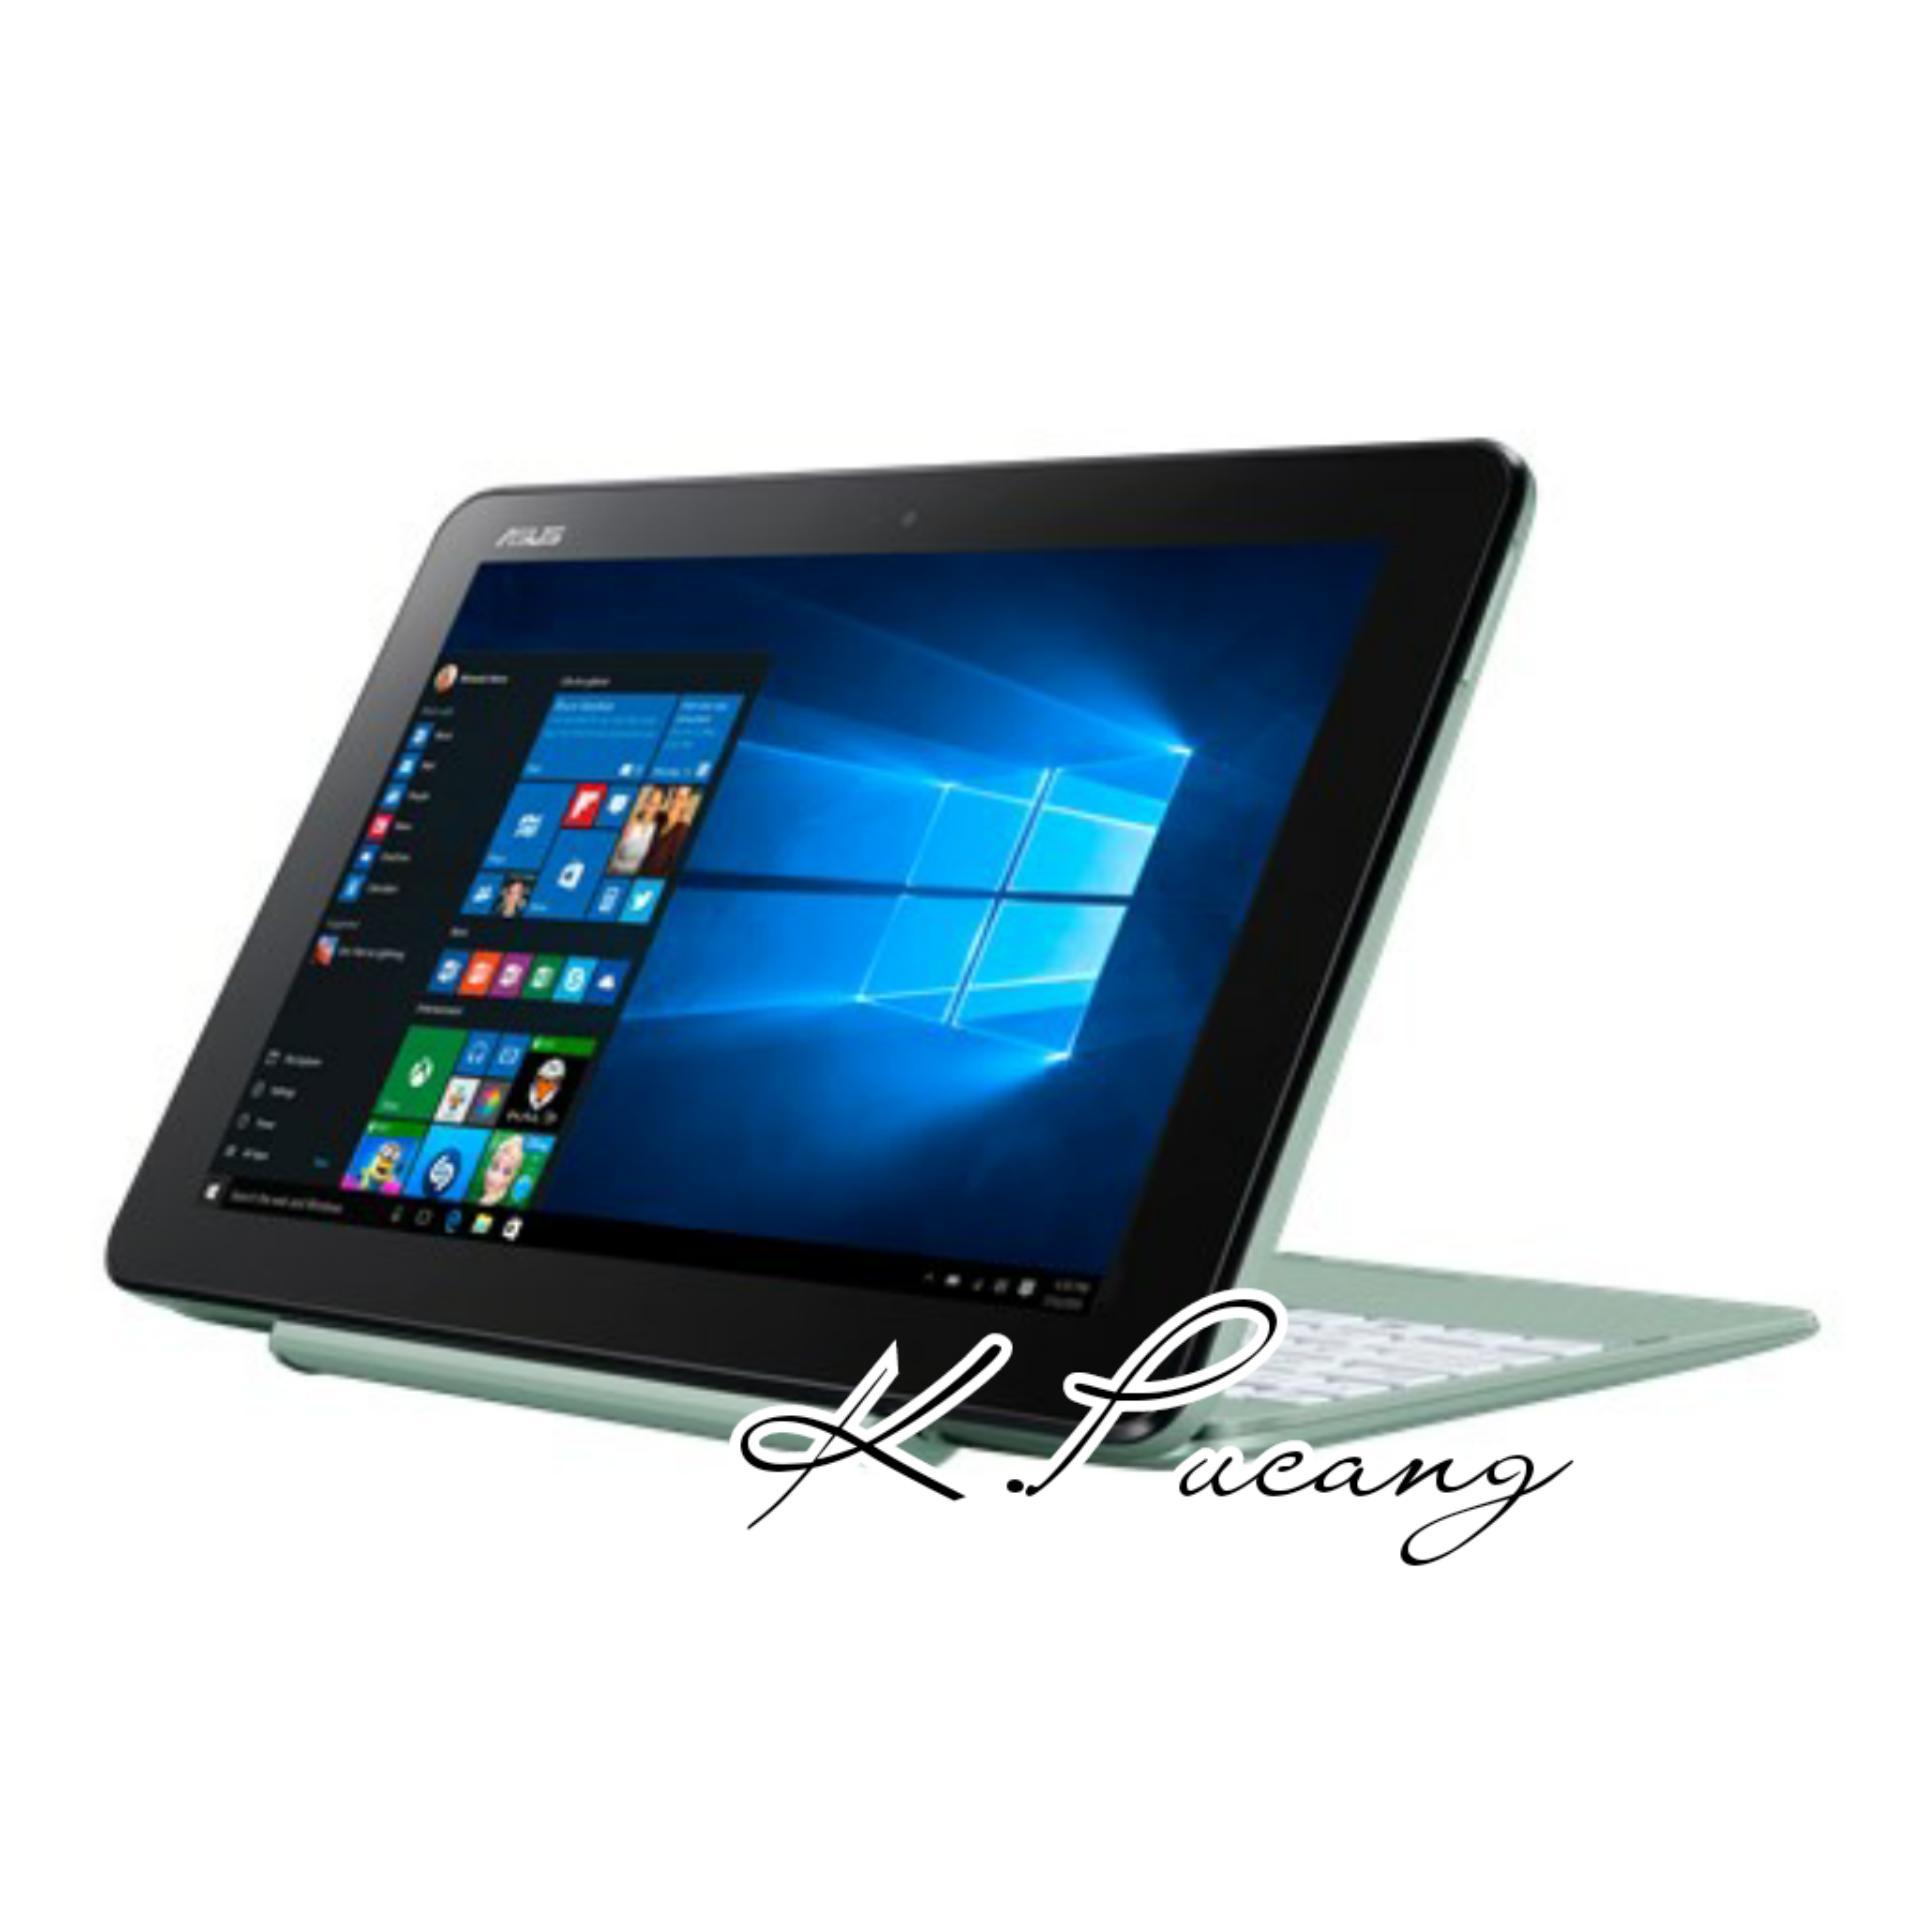 Penawaran Diskon Terbaik Acer E5 475g 541u Core I5 7200u Kabylake Aspire Gr Intel Asus T101ha Gr011t I Quad Z8350 Processor 2 Gb Ddr3 128gbemmc